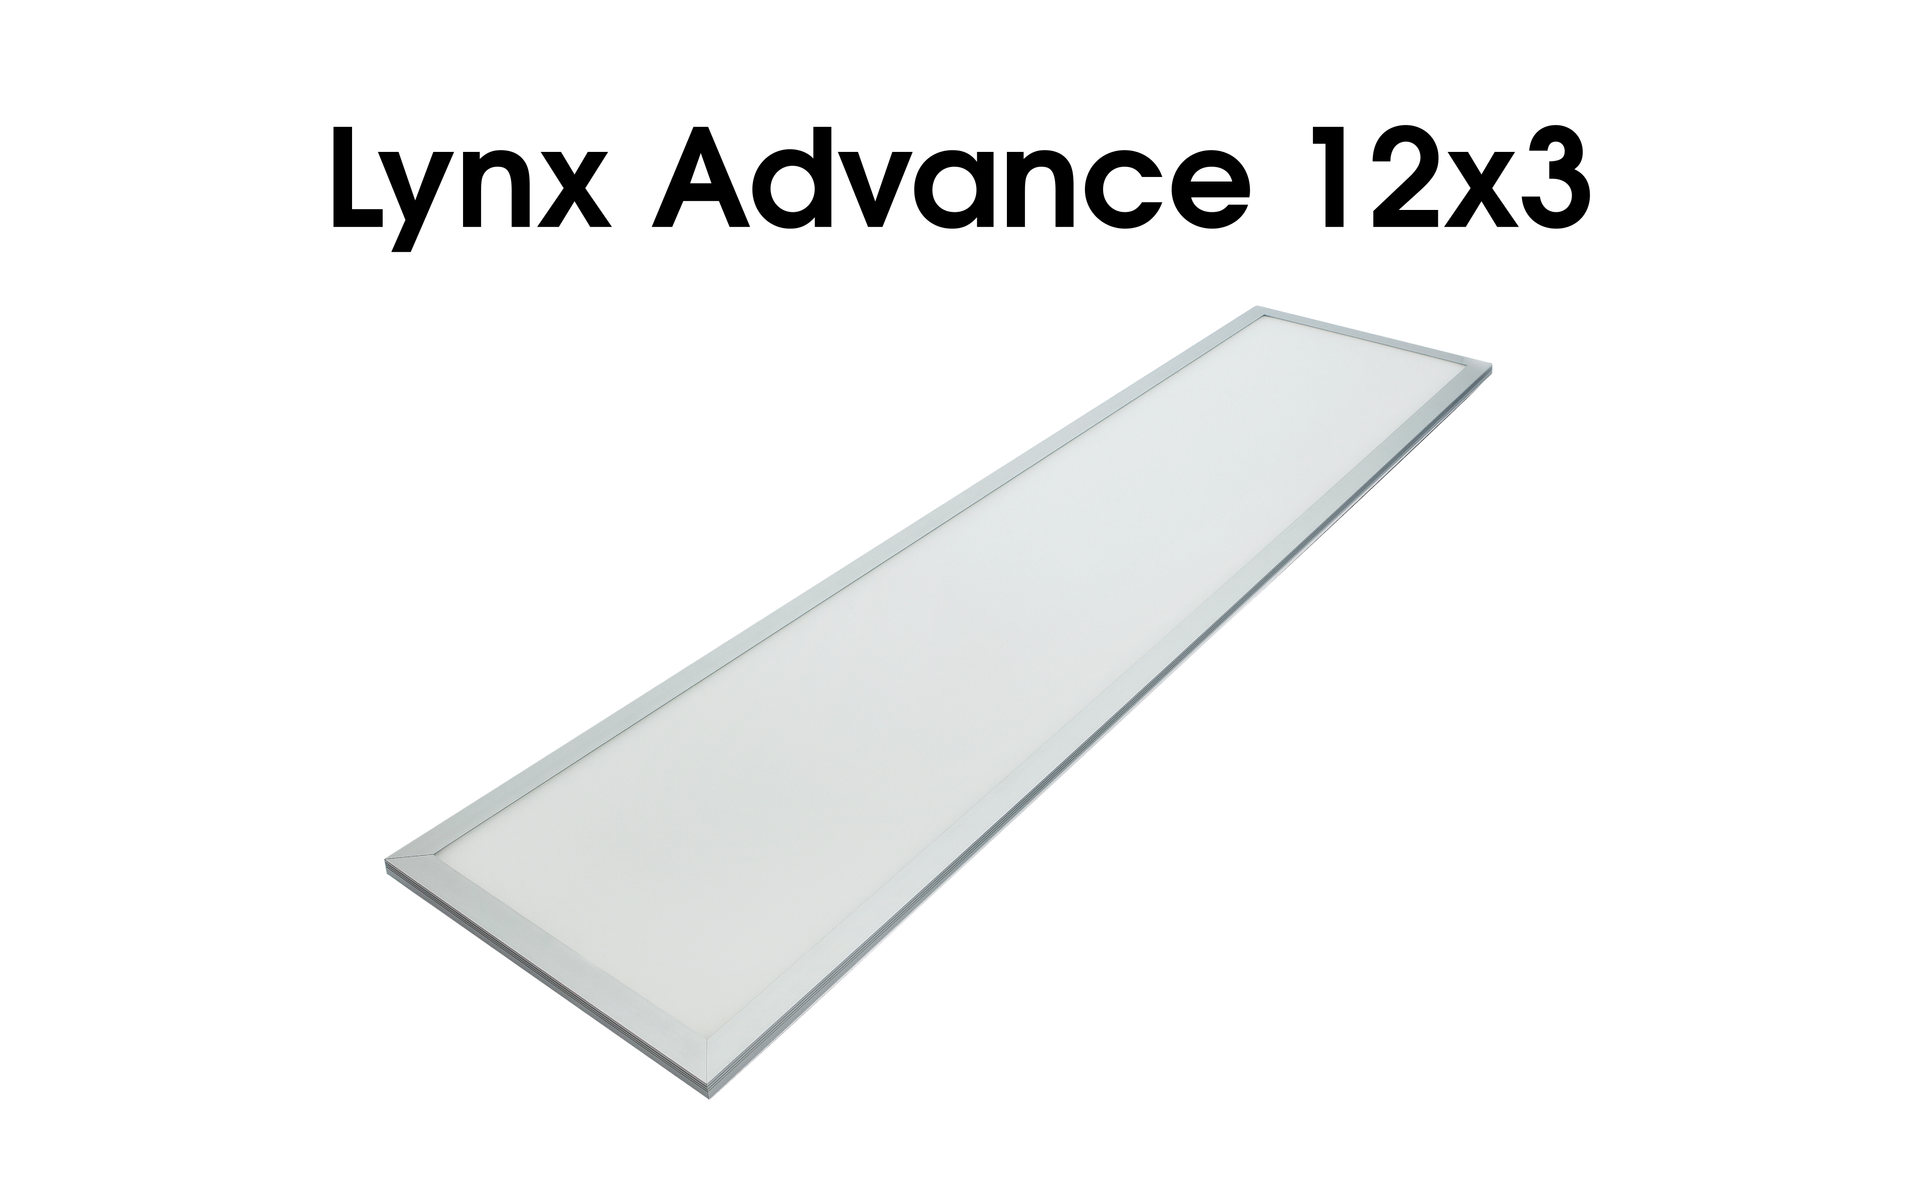 Lynx Adv 12x3 Mobile-01.png